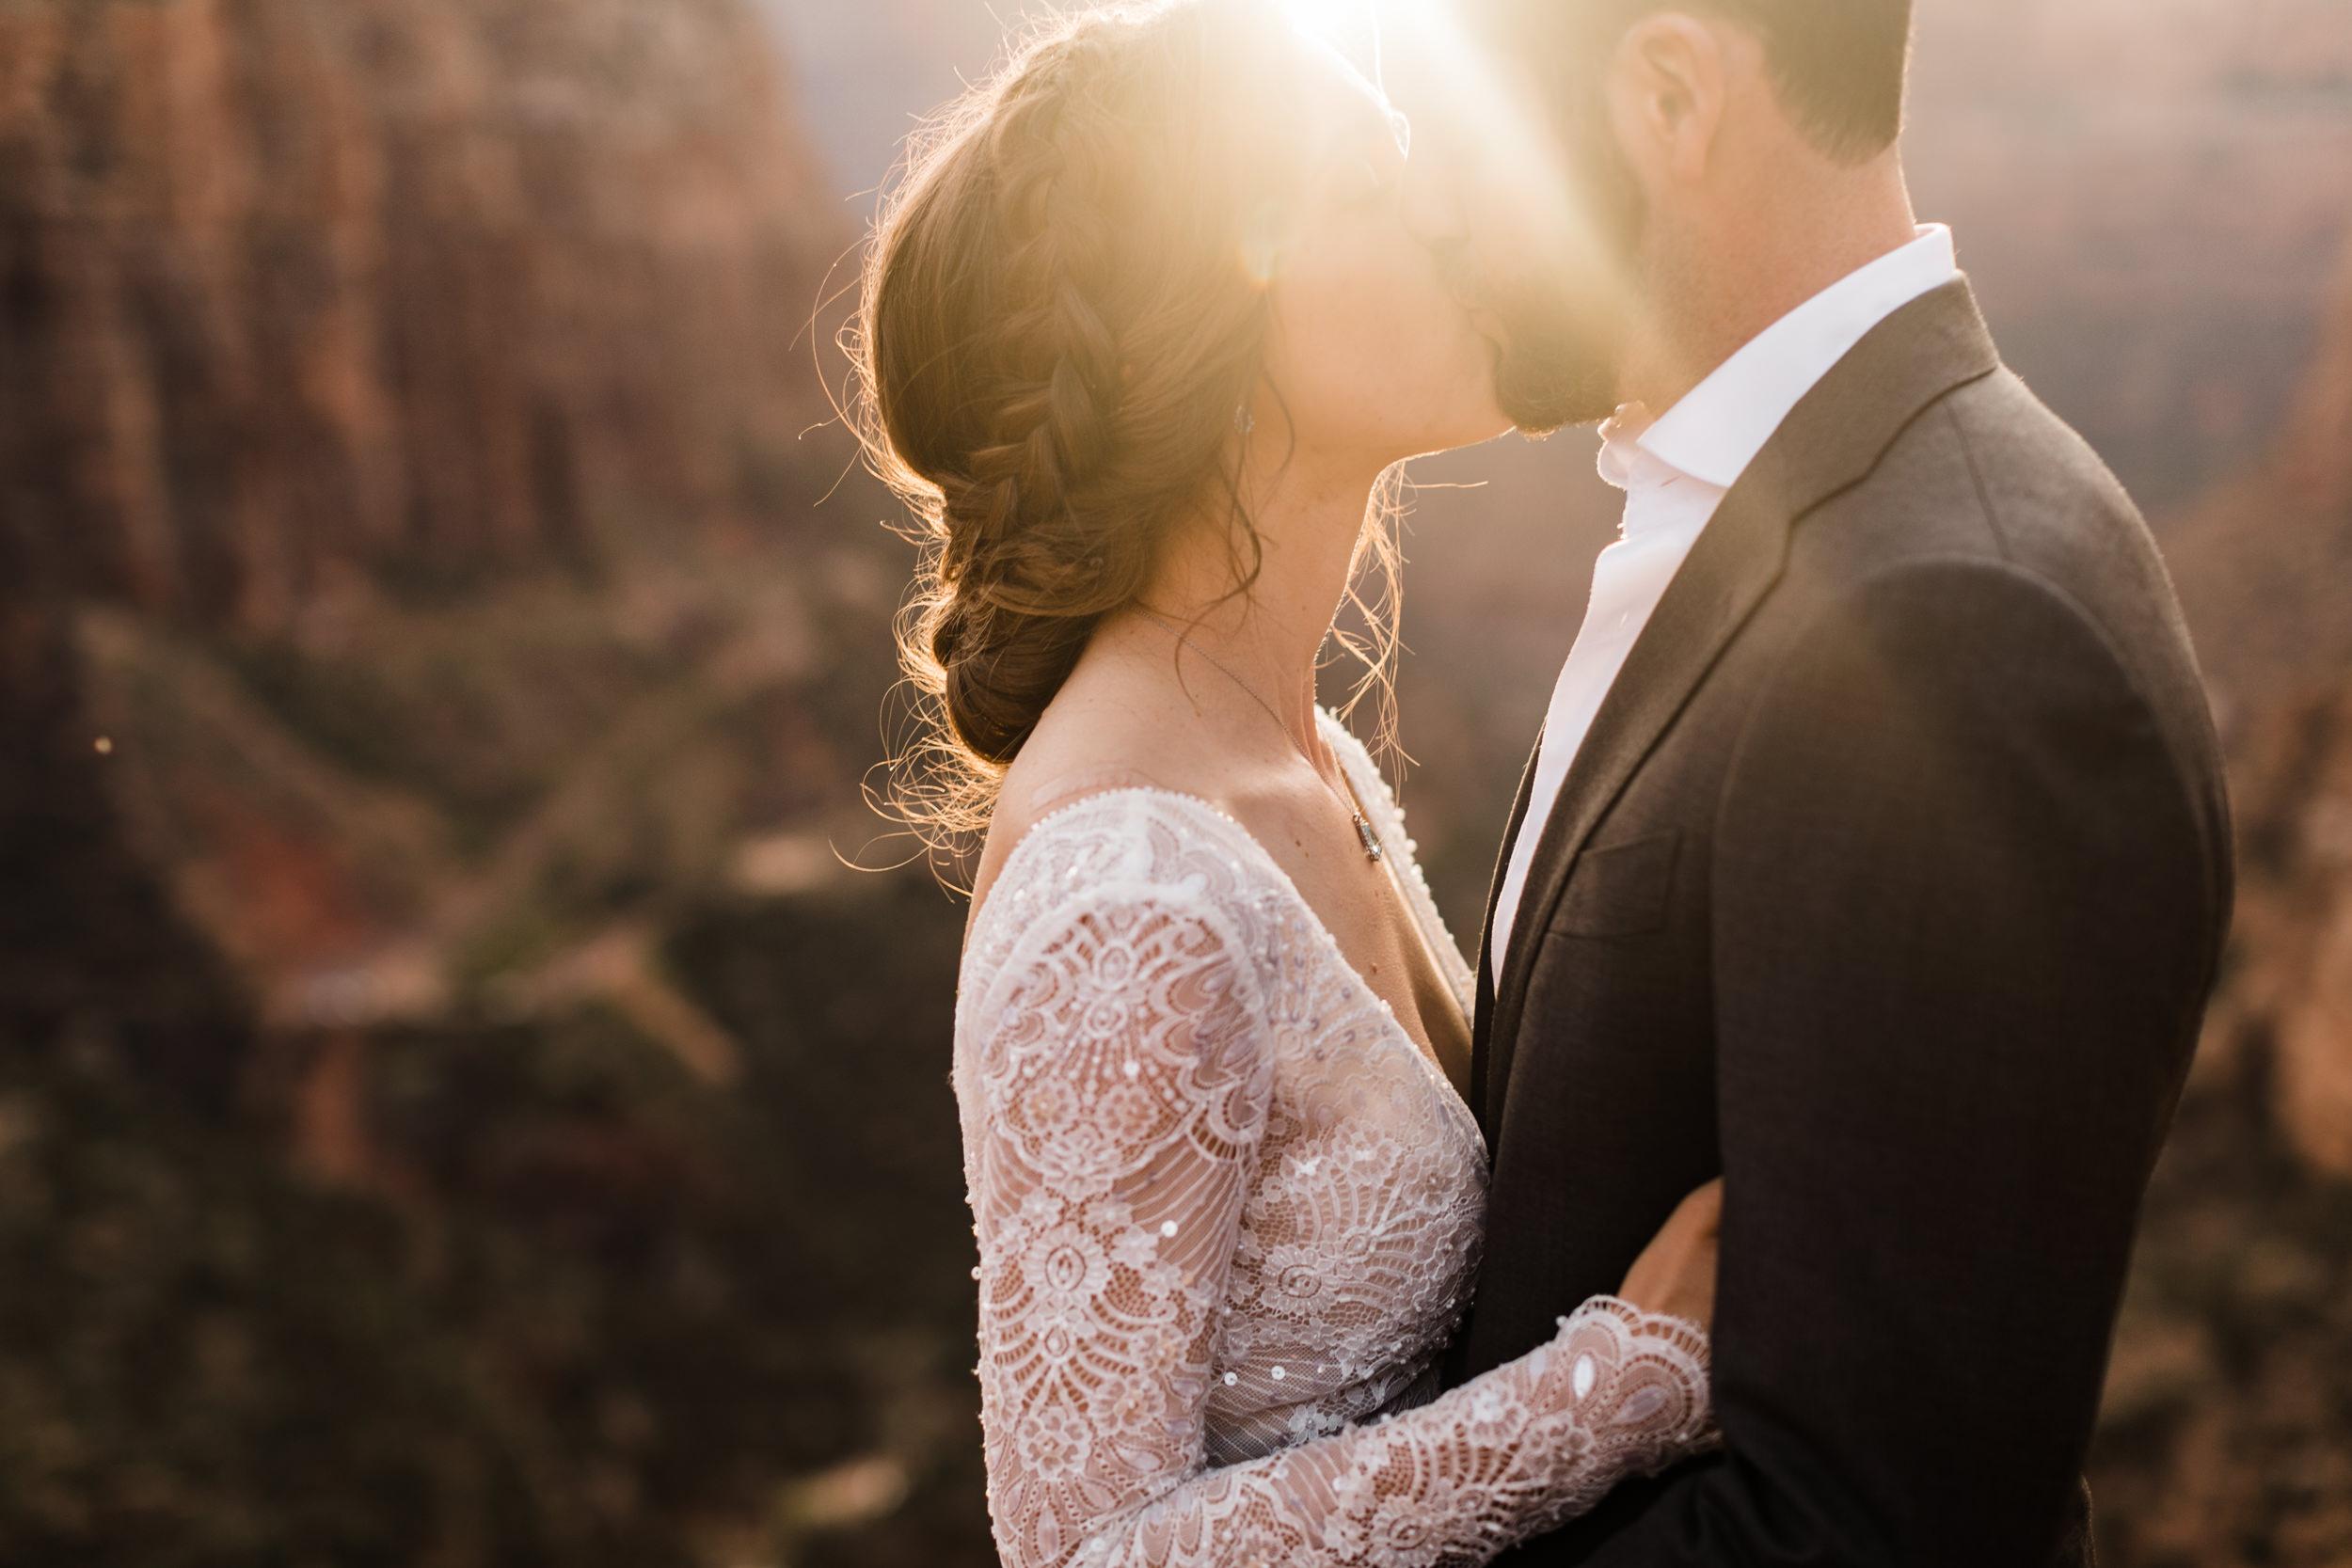 Zion-National-Park-Adventure-Wedding-Hearnes-Elopement-Photography-50.jpg